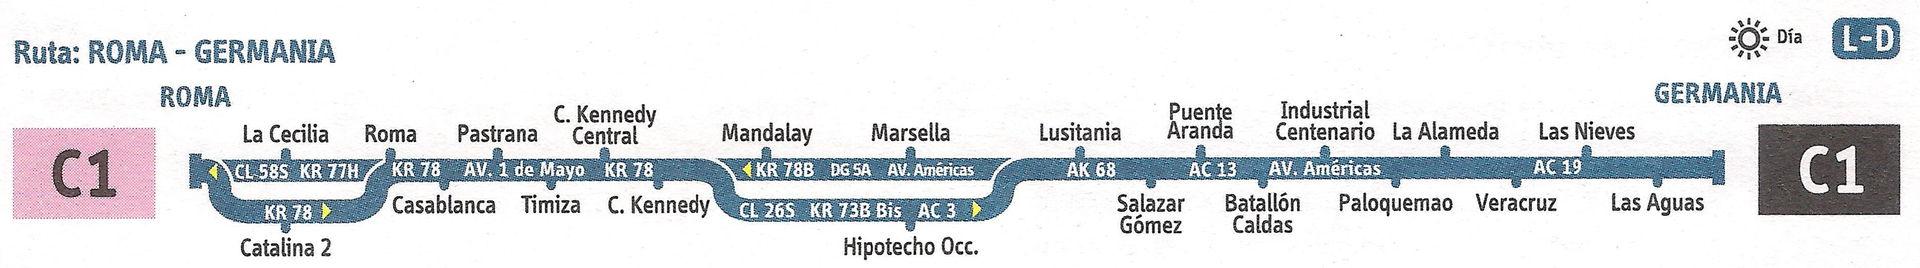 Ruta SITP: C1 Roma ↔ Germania [Urbana] 1